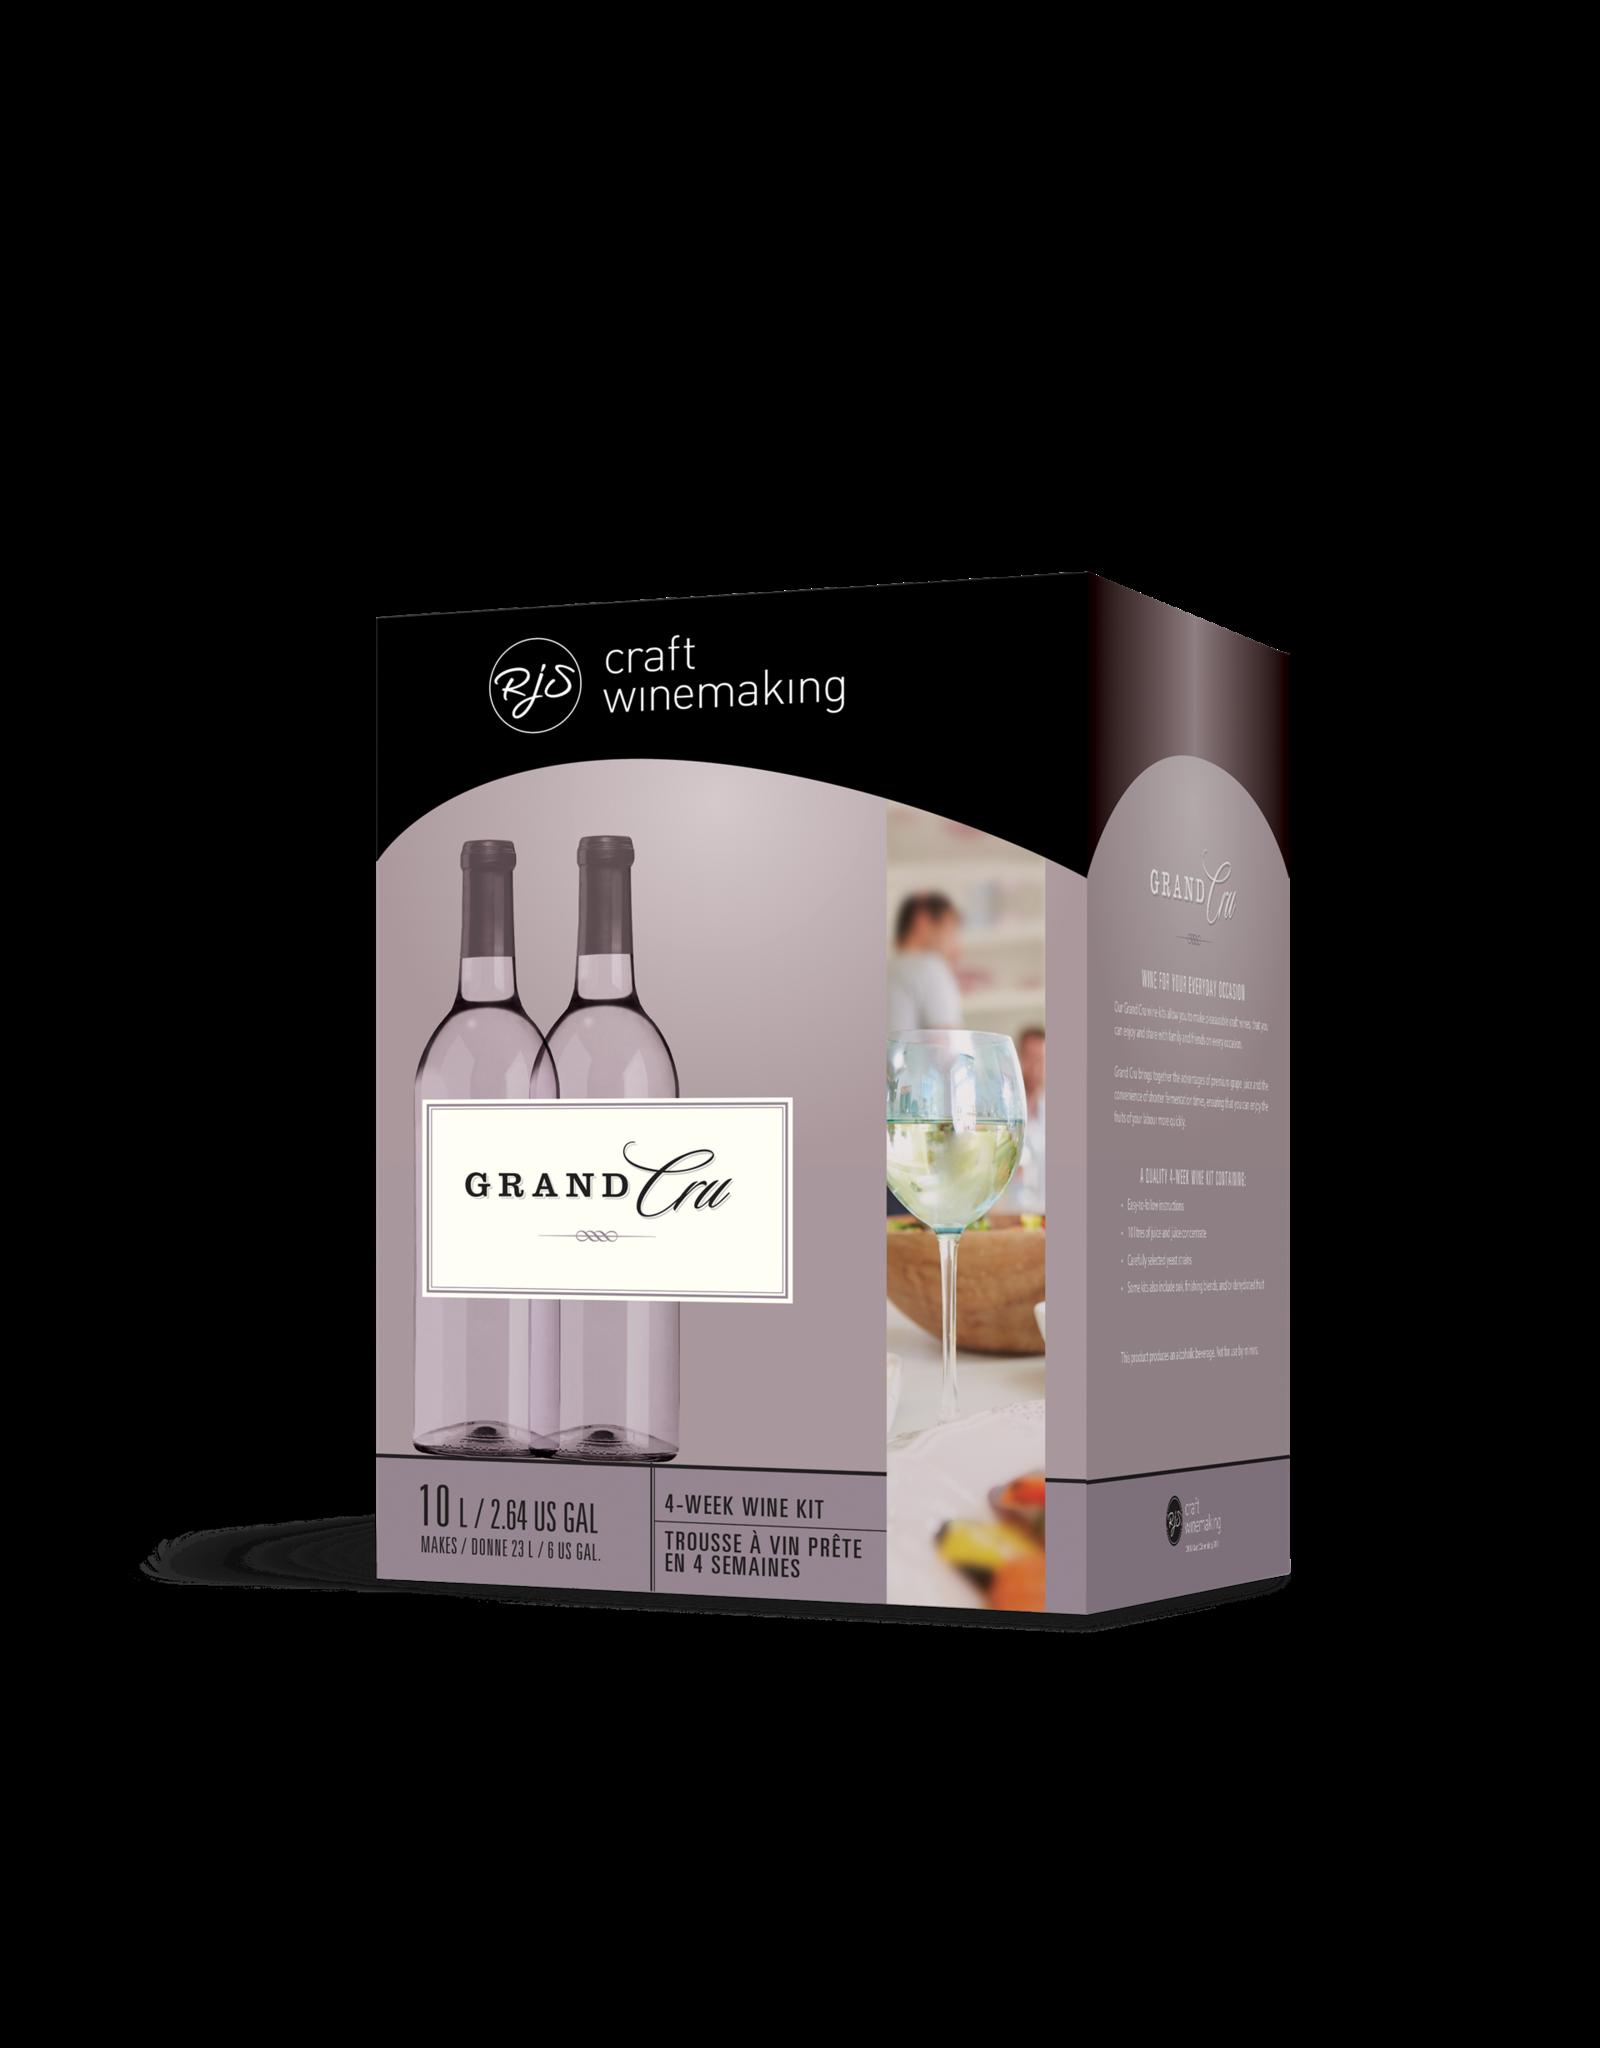 RJS Grand Cru Chardonnay